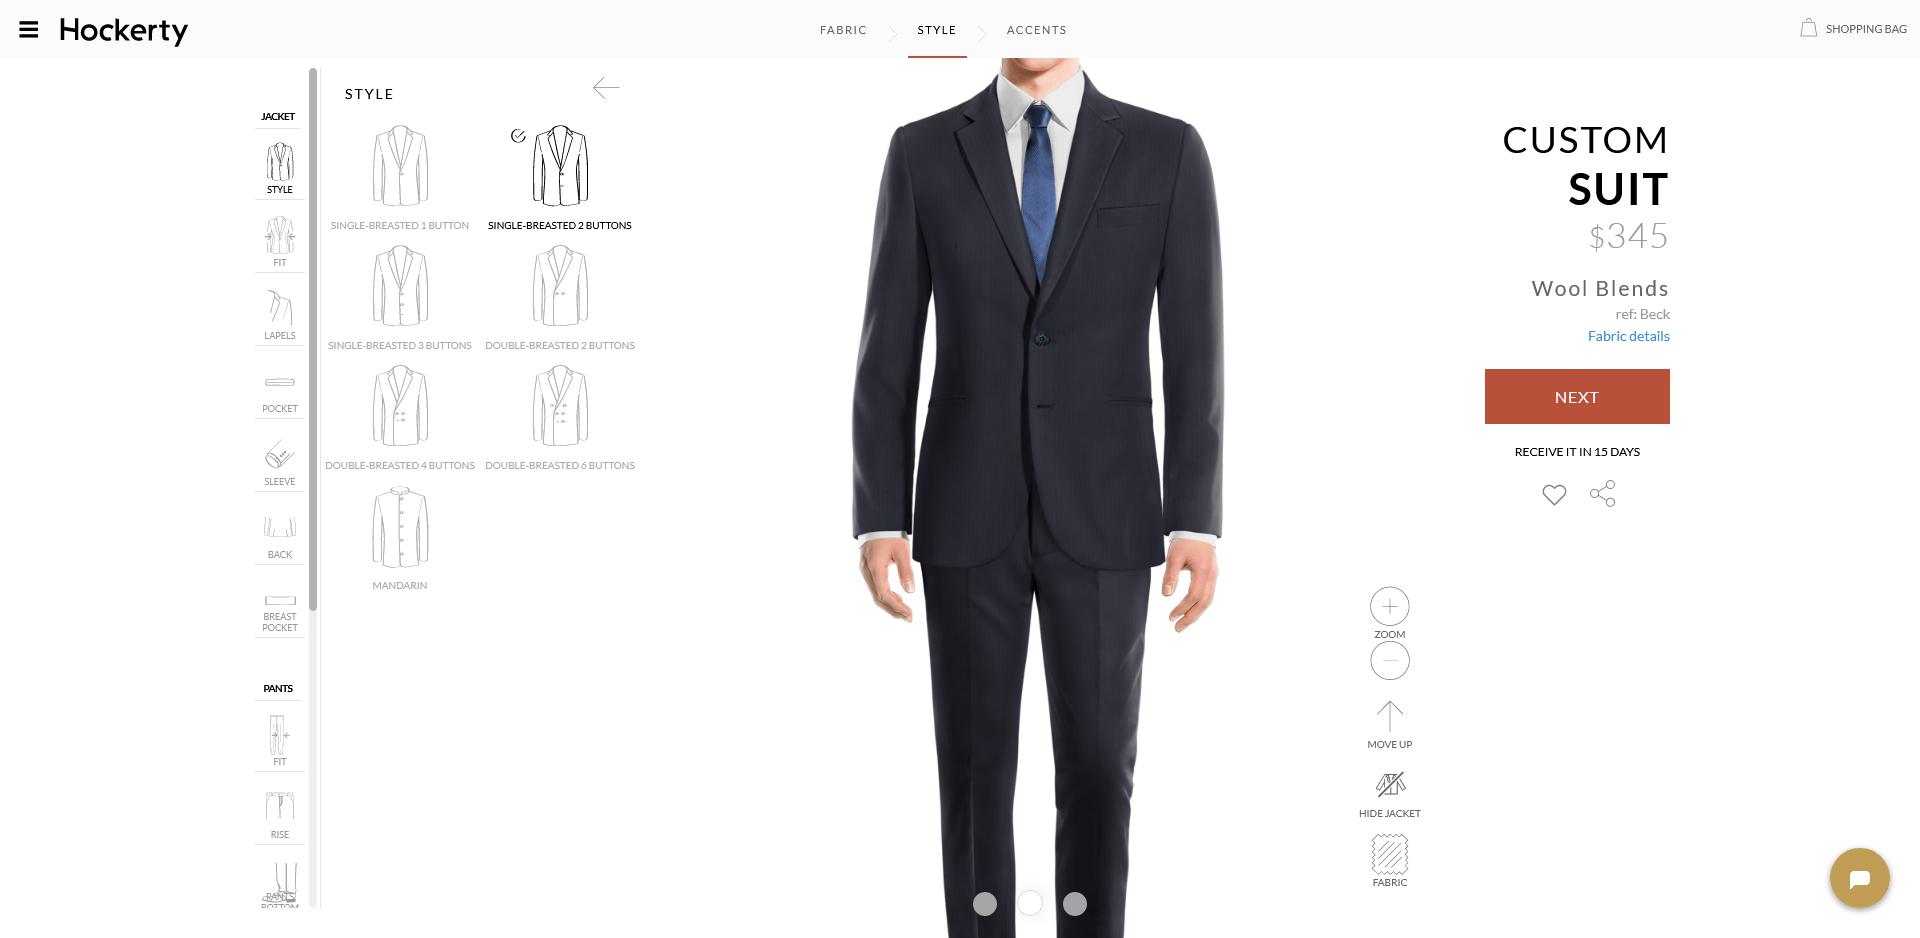 Hockerty suits jacket style options